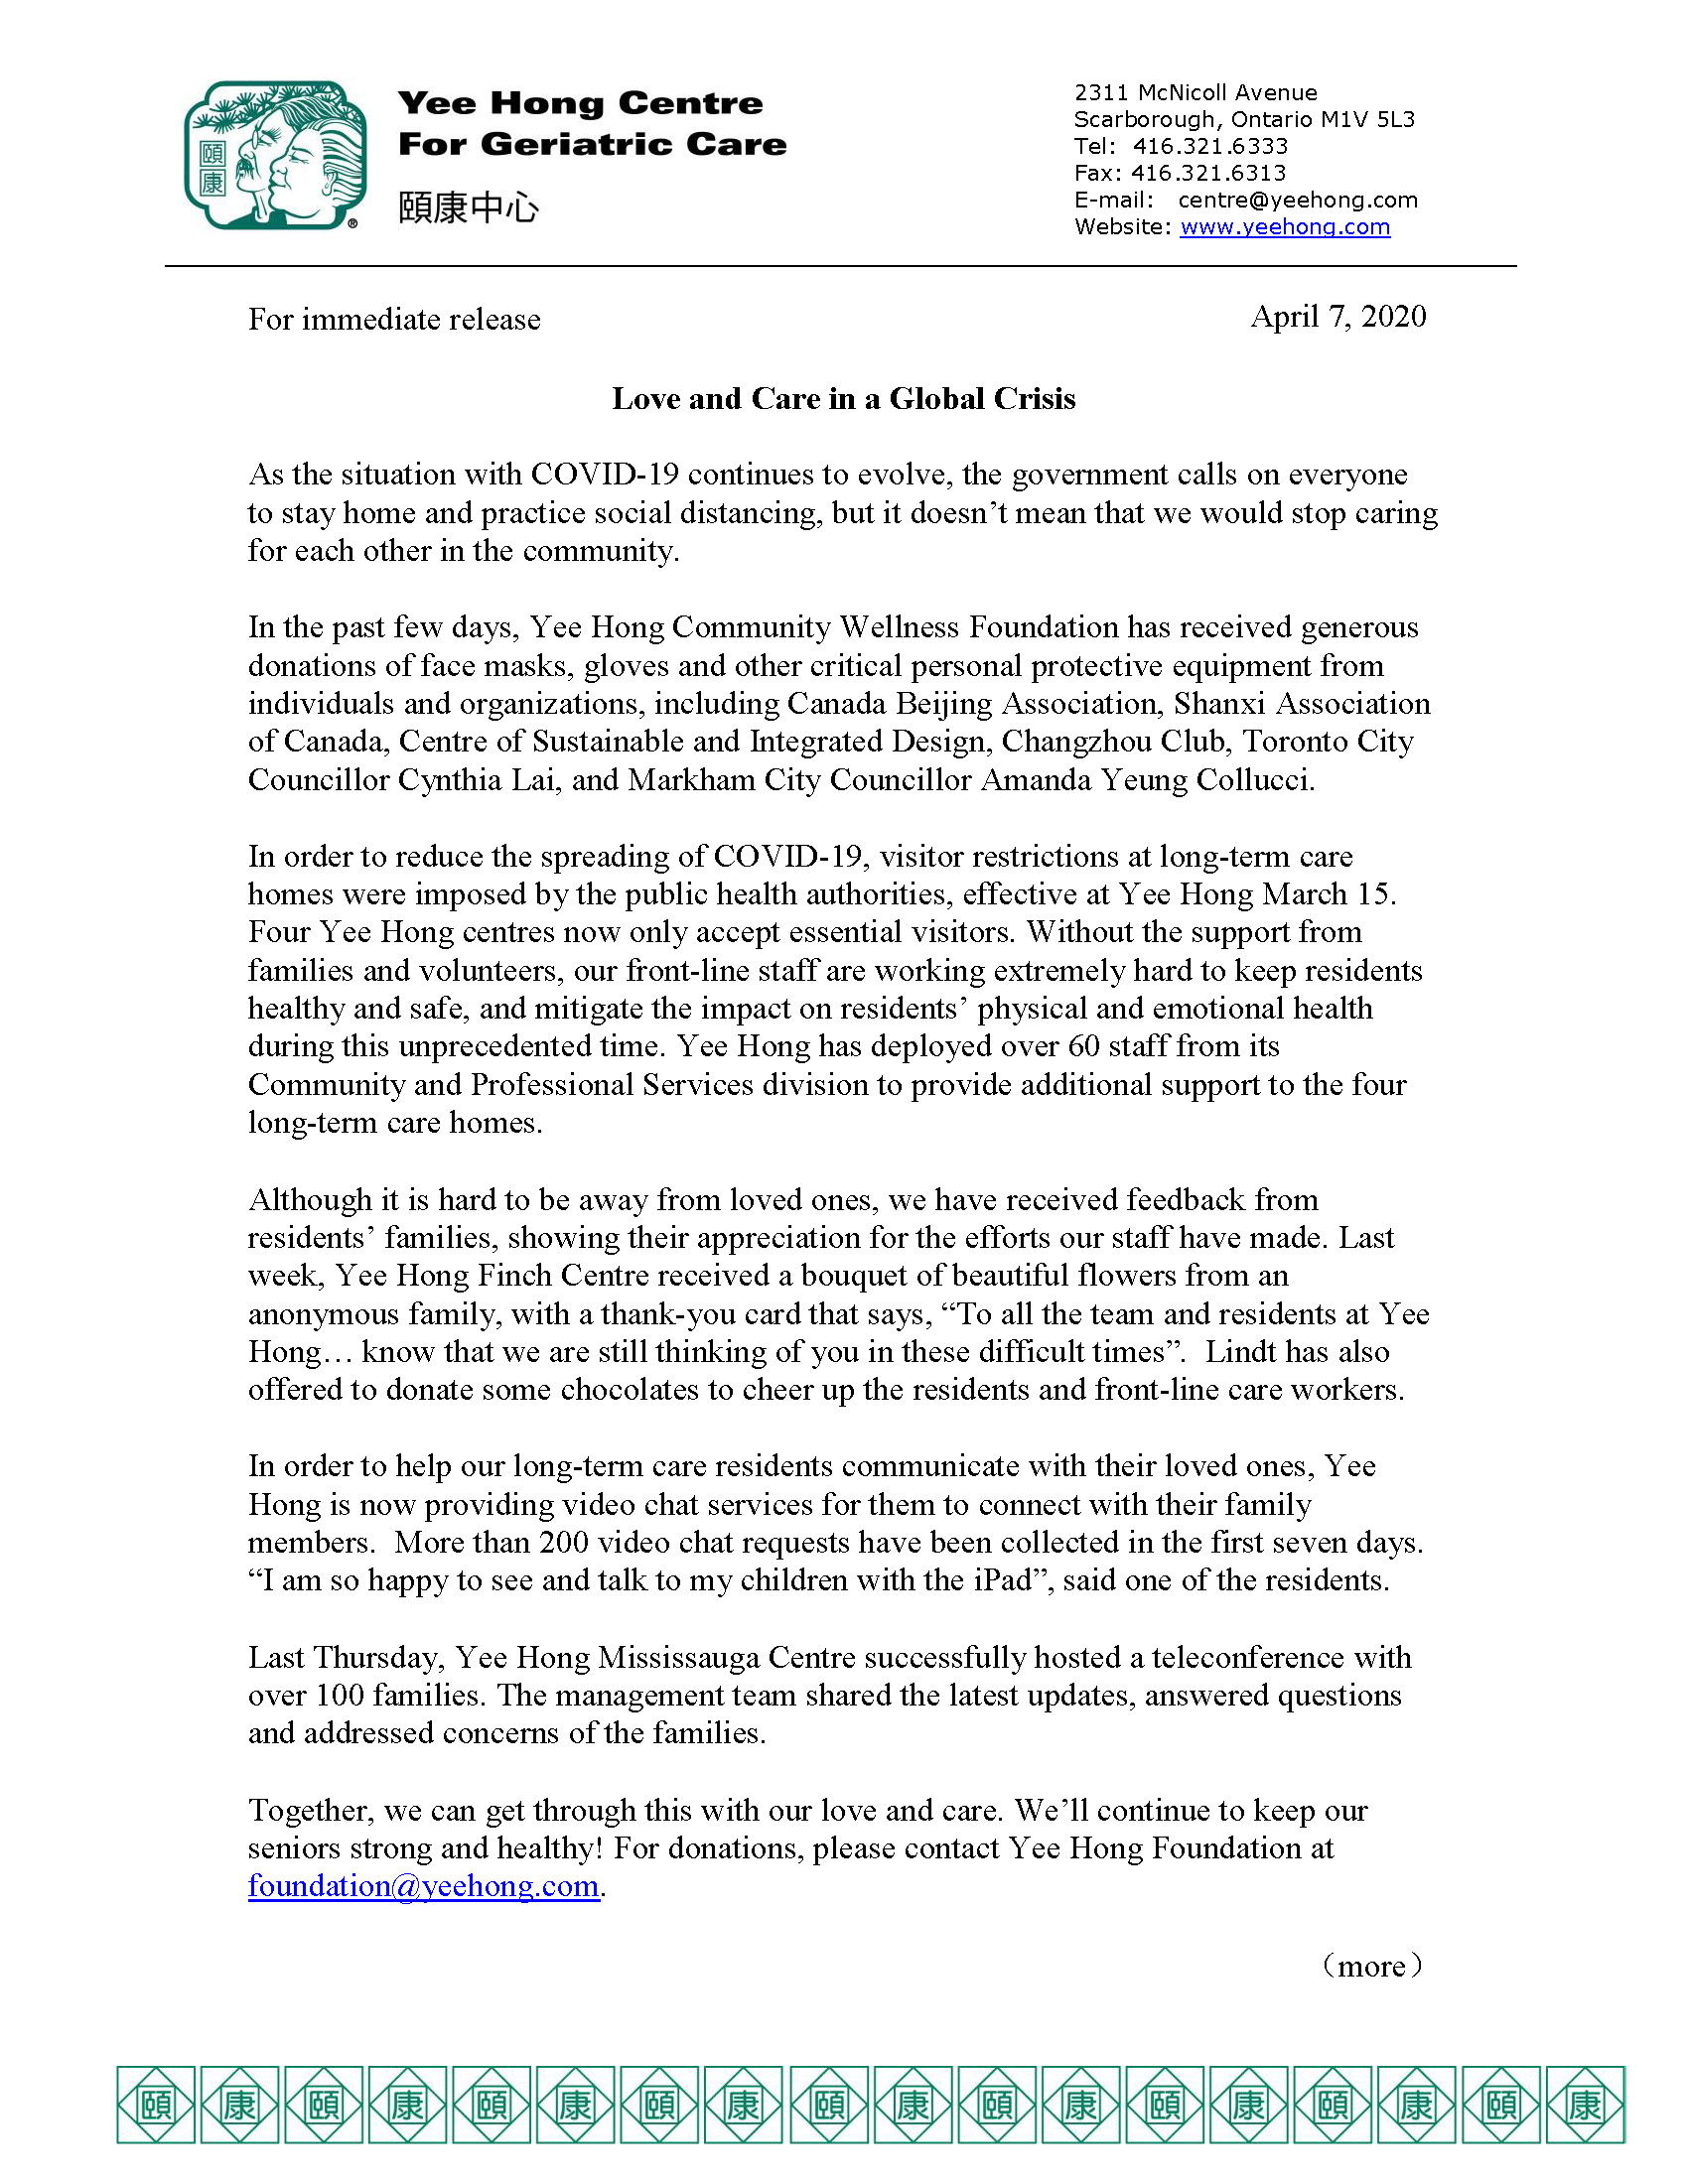 News Release Apr 7, 2020